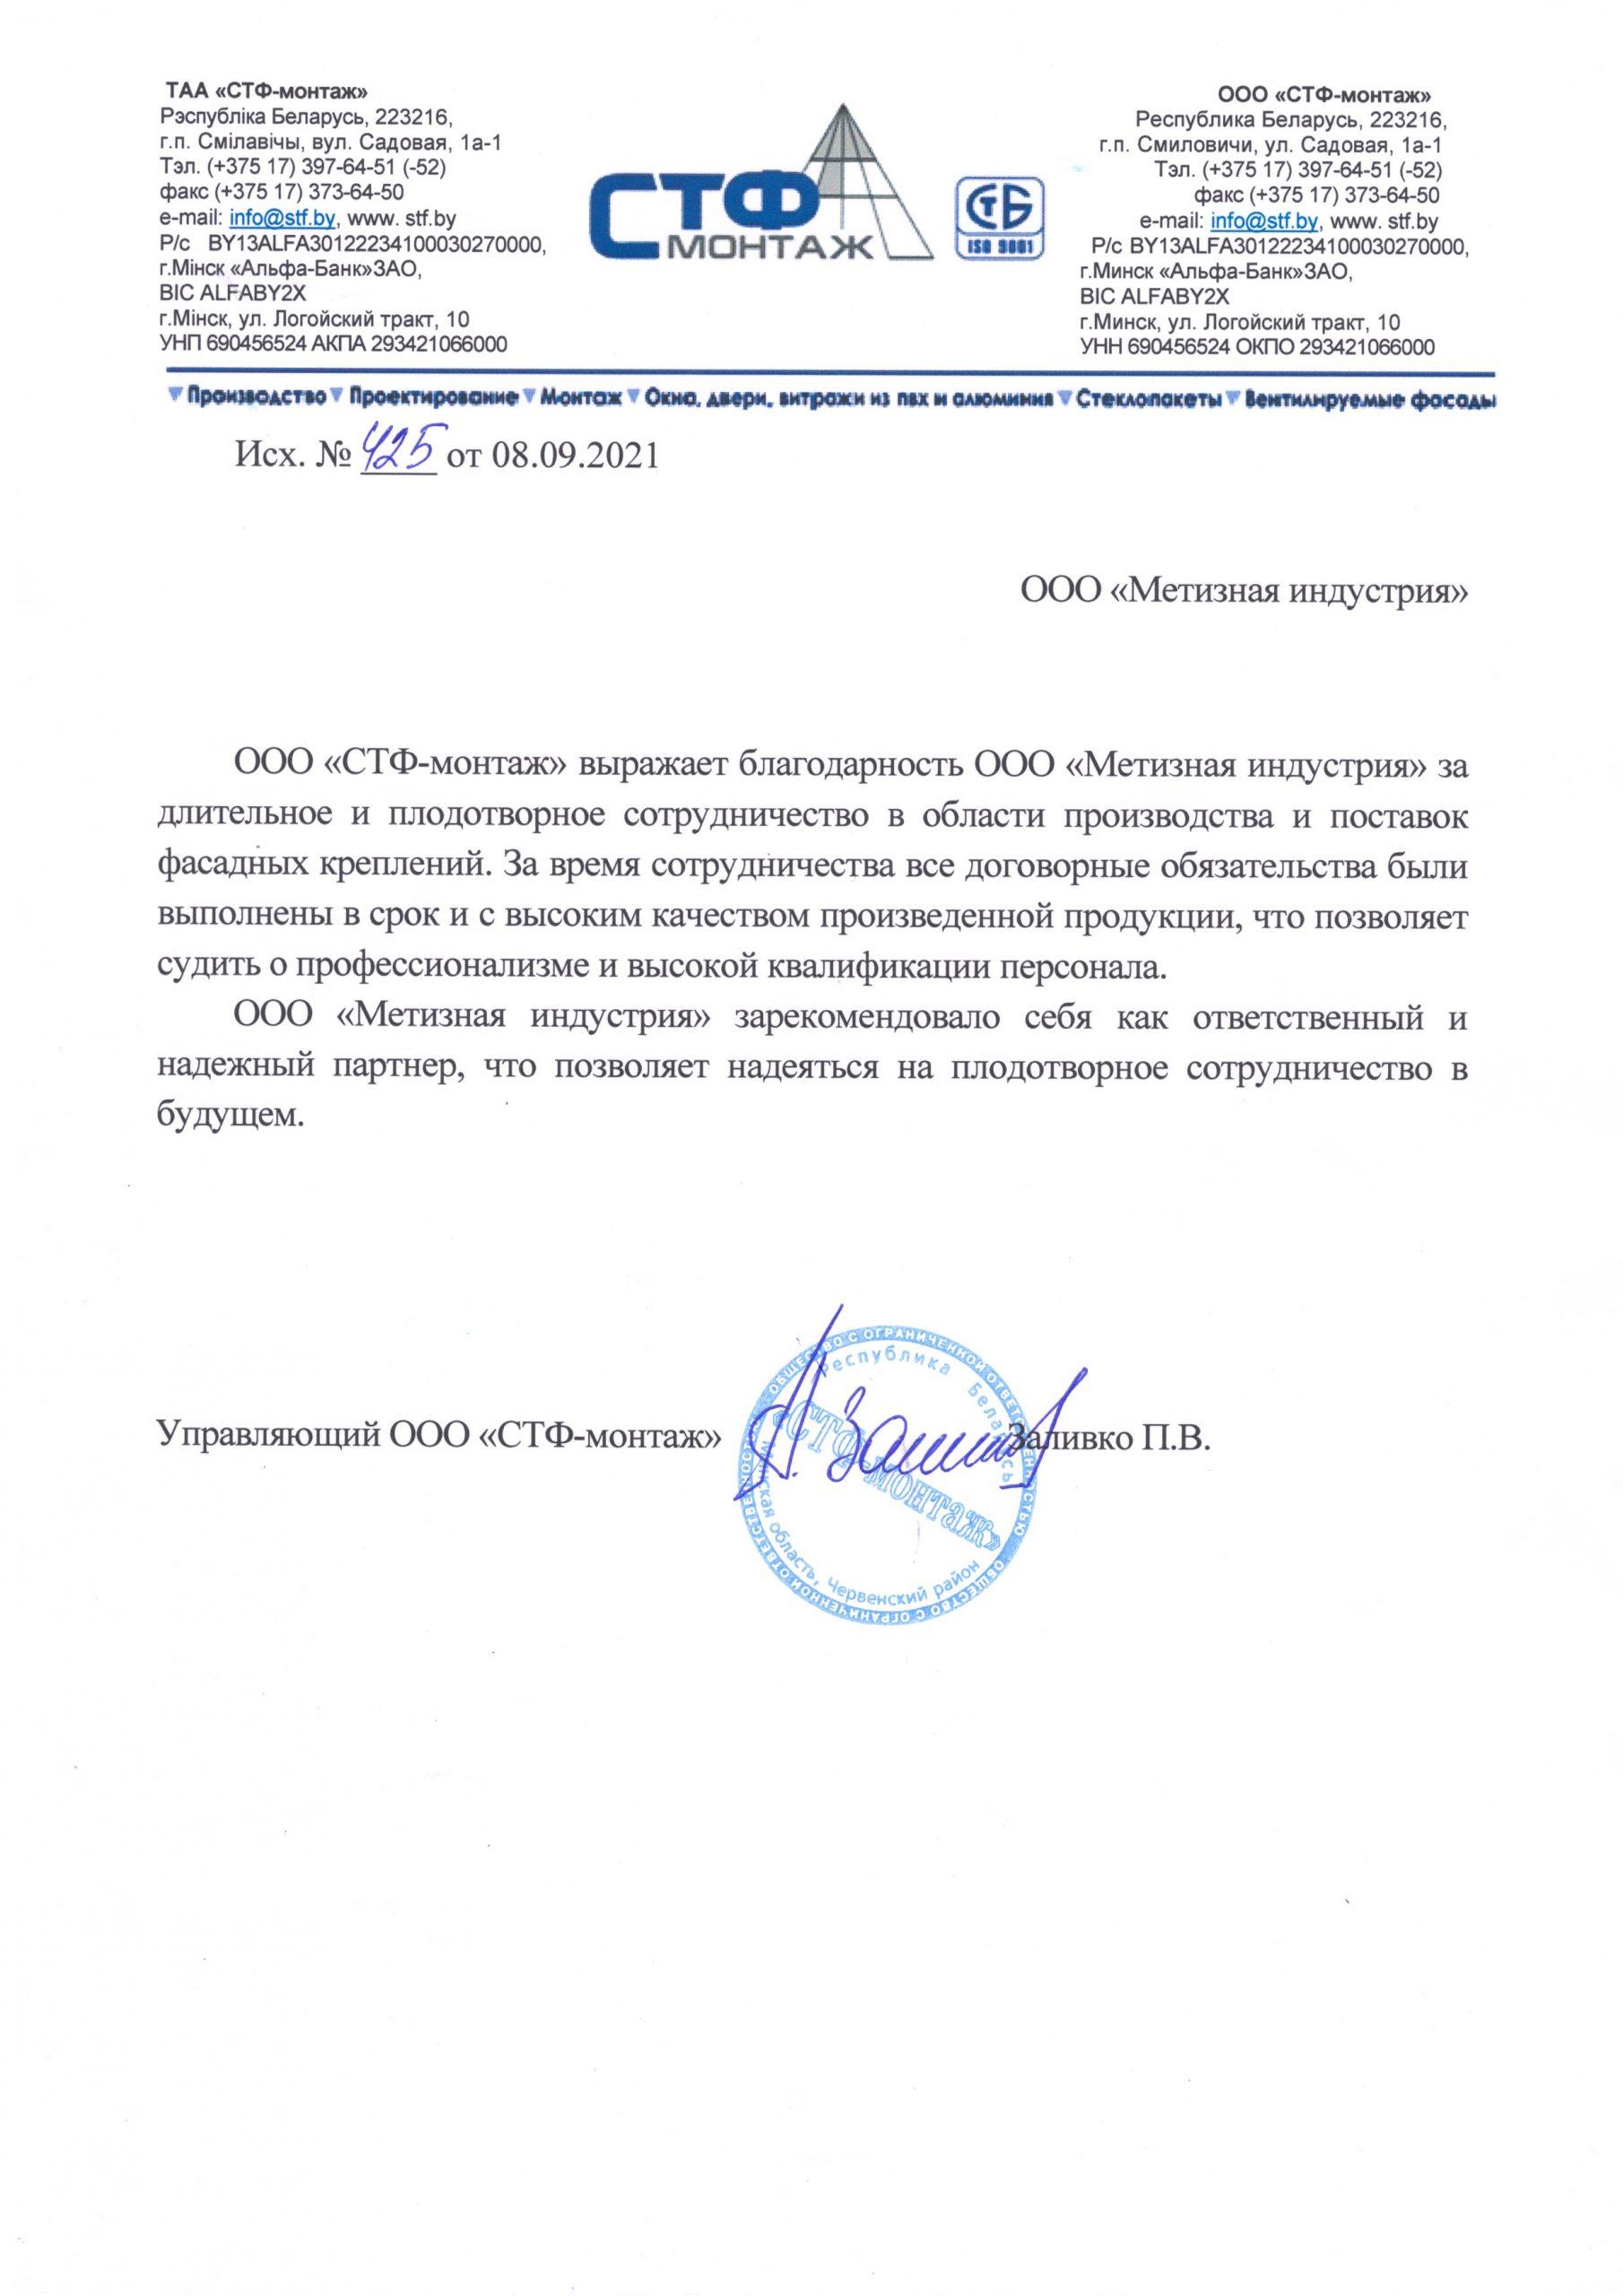 СТФ-монтаж